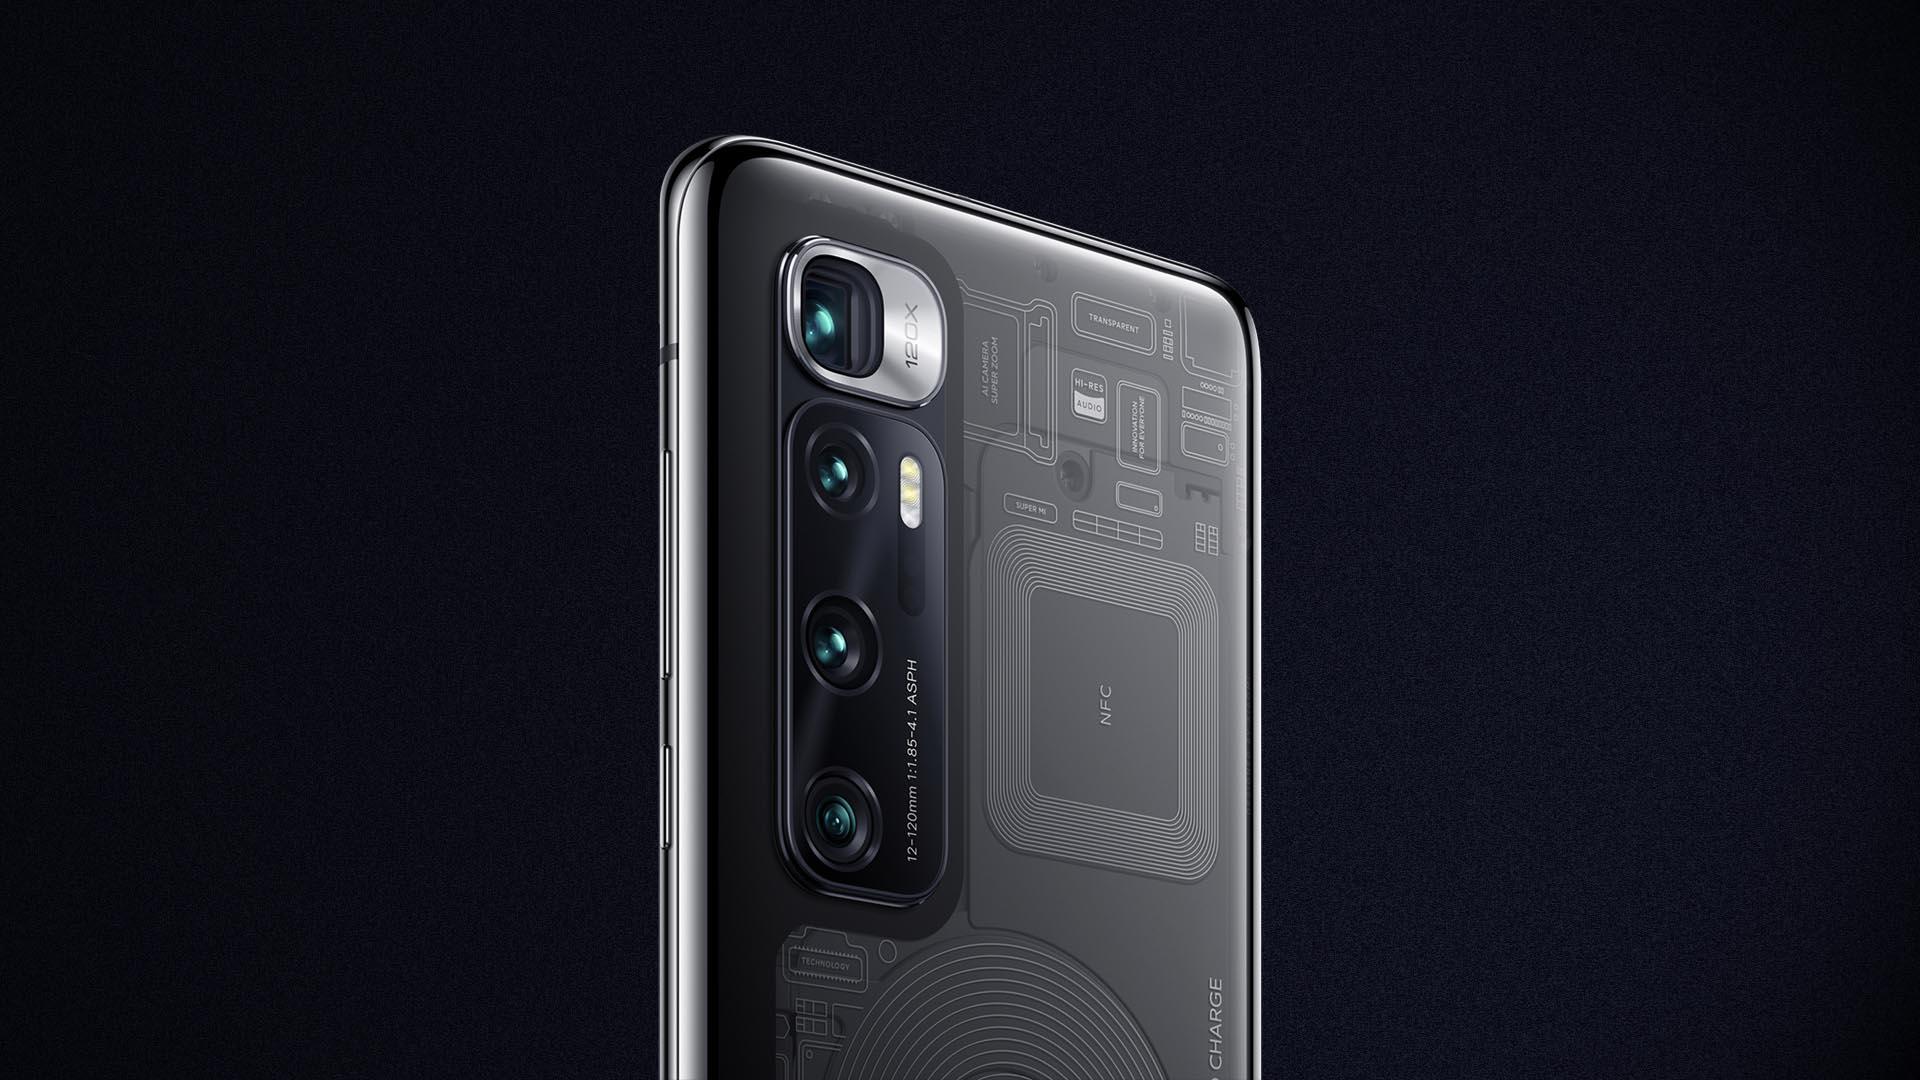 Followed by Mi TV Transparent Edition: will Xiaomi release a transparent  smartphone? - Geek Tech Online